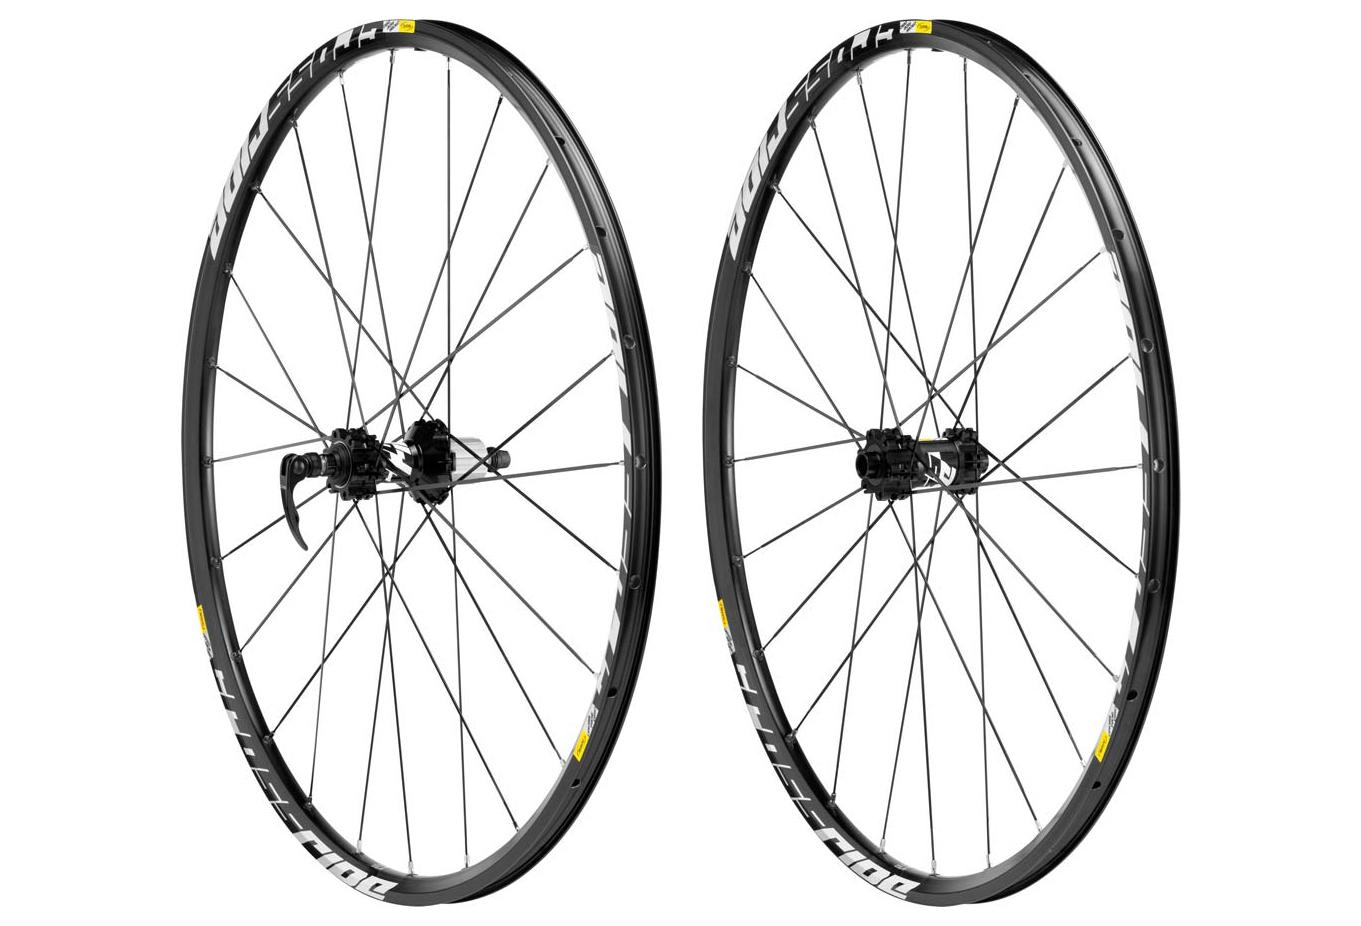 mavic paire de roues crossride 29 axes 15x100mm av 142x12mm ar corps de roue libre. Black Bedroom Furniture Sets. Home Design Ideas